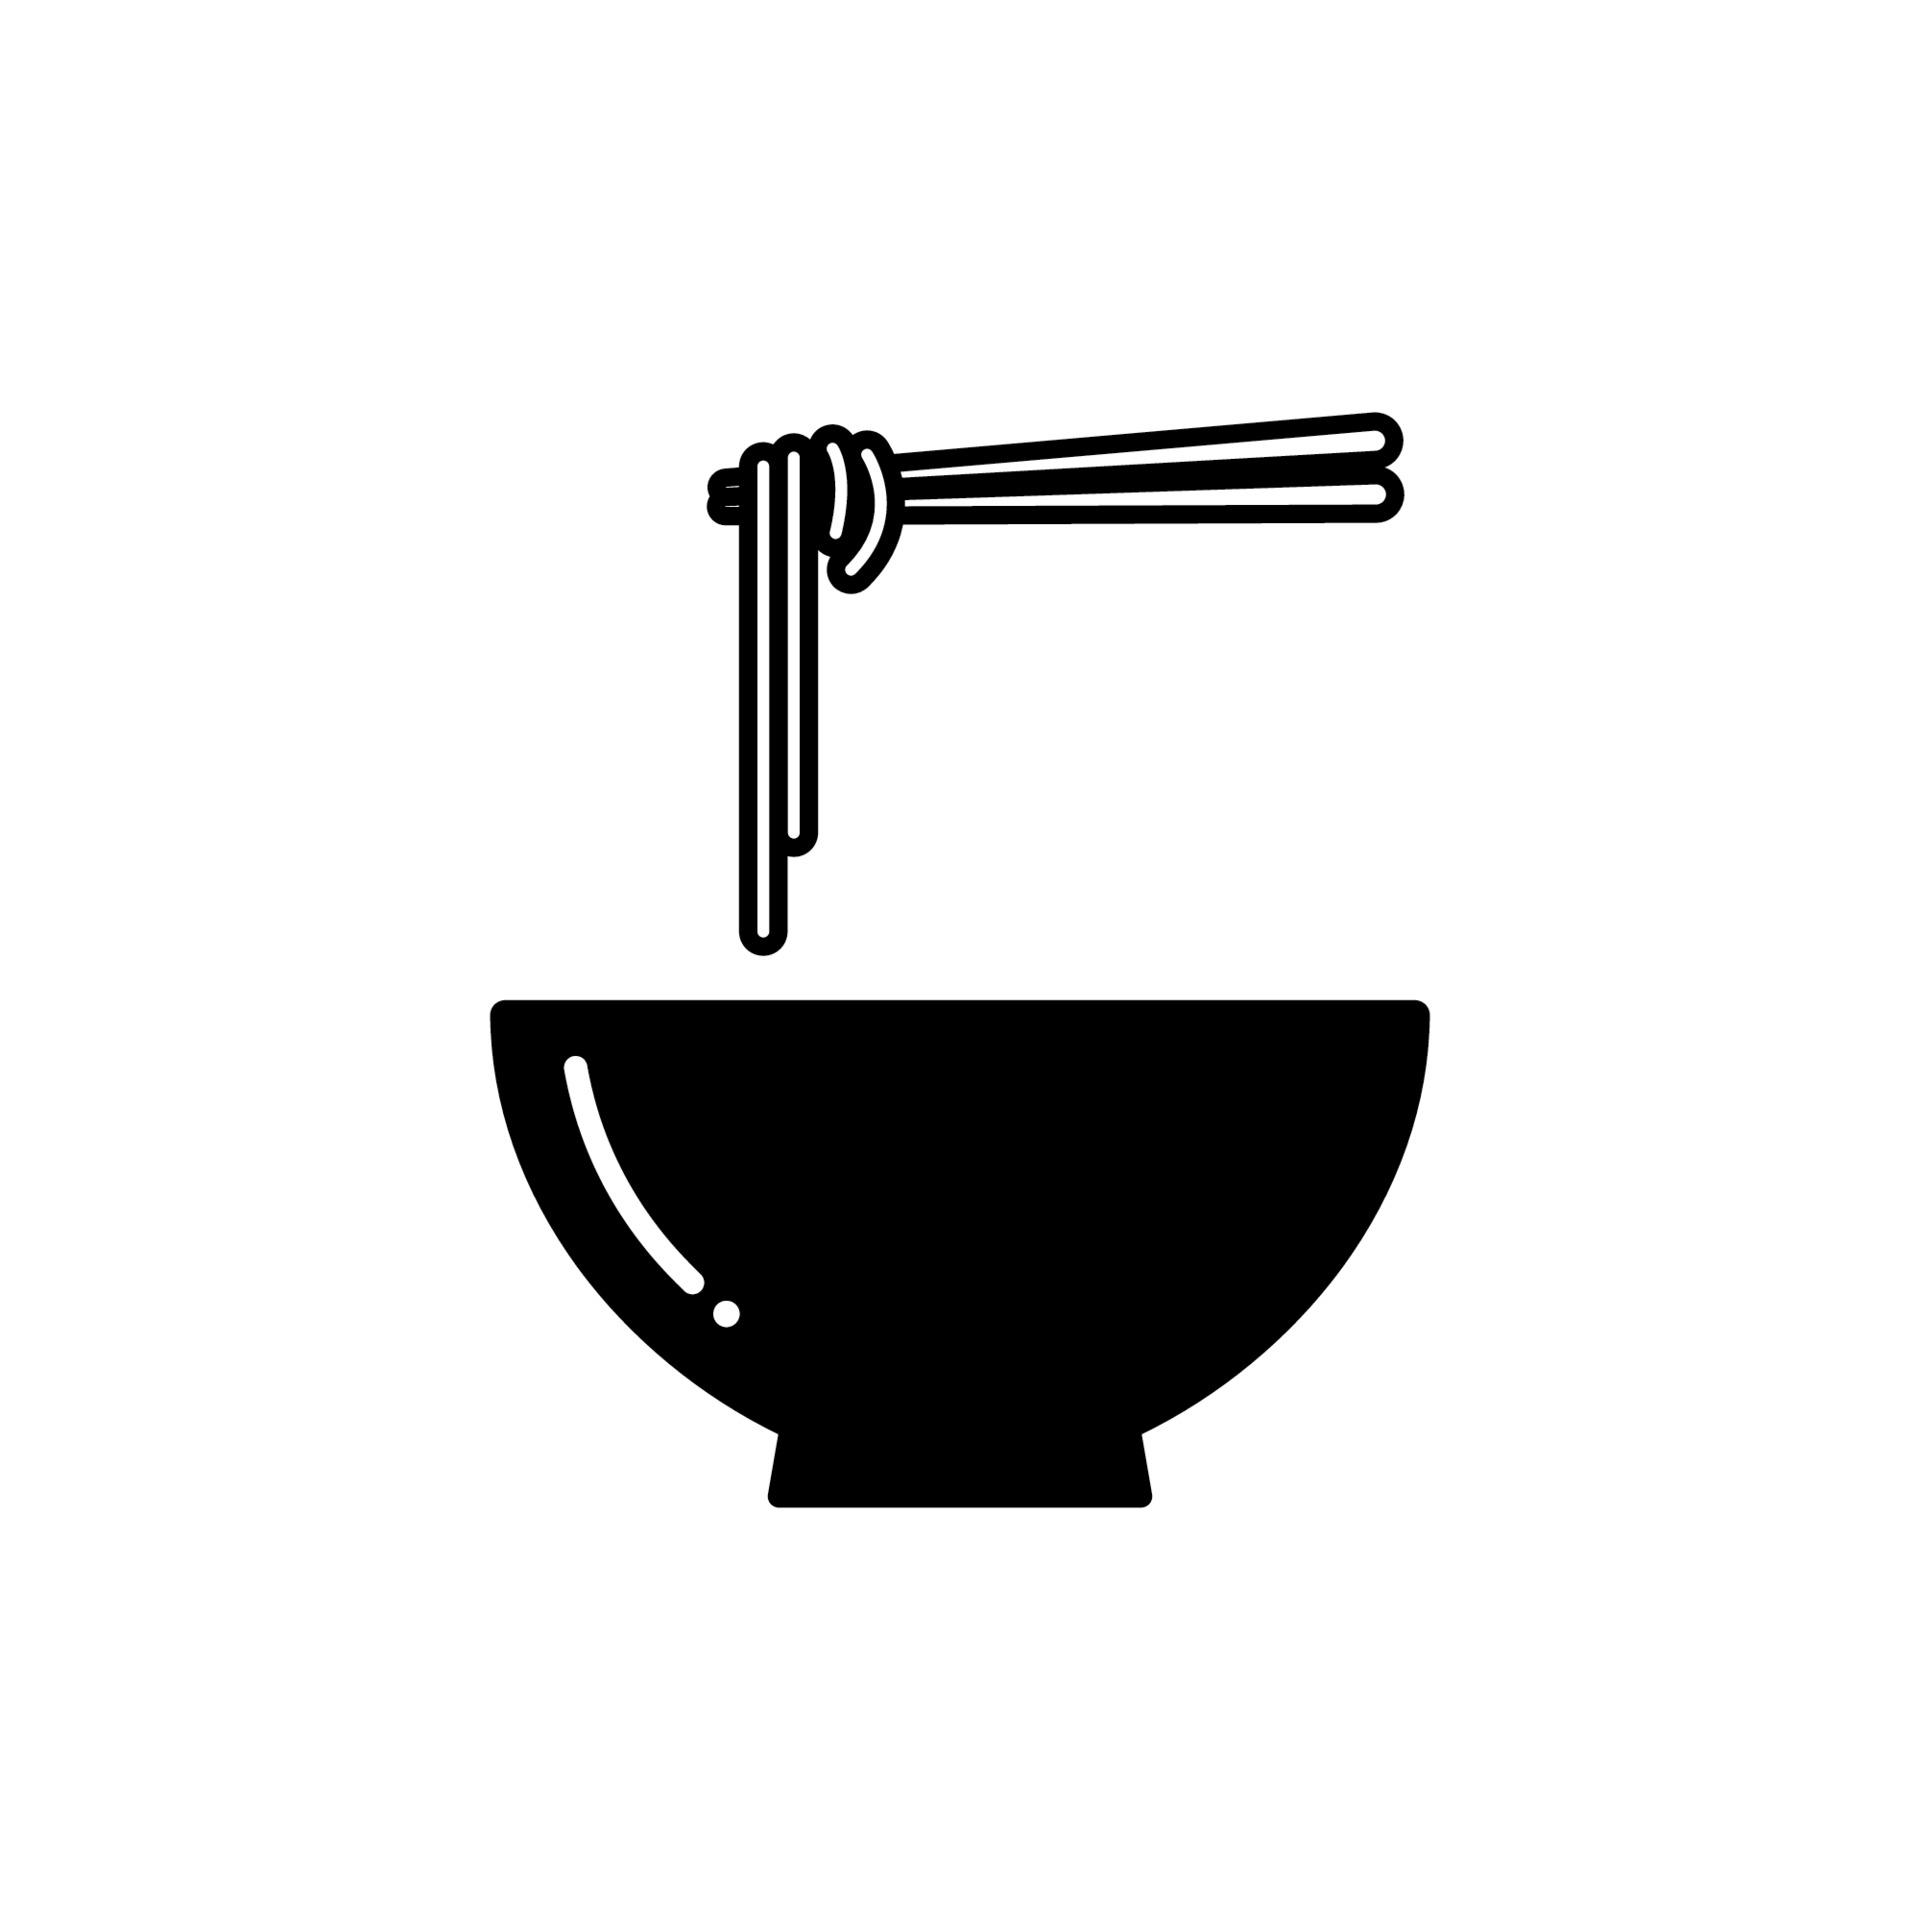 Noodle Soup Bowl With Chopsticks Icon Bowl Of Ramen Noodle Icon Download Free Vectors Clipart Graphics Vector Art